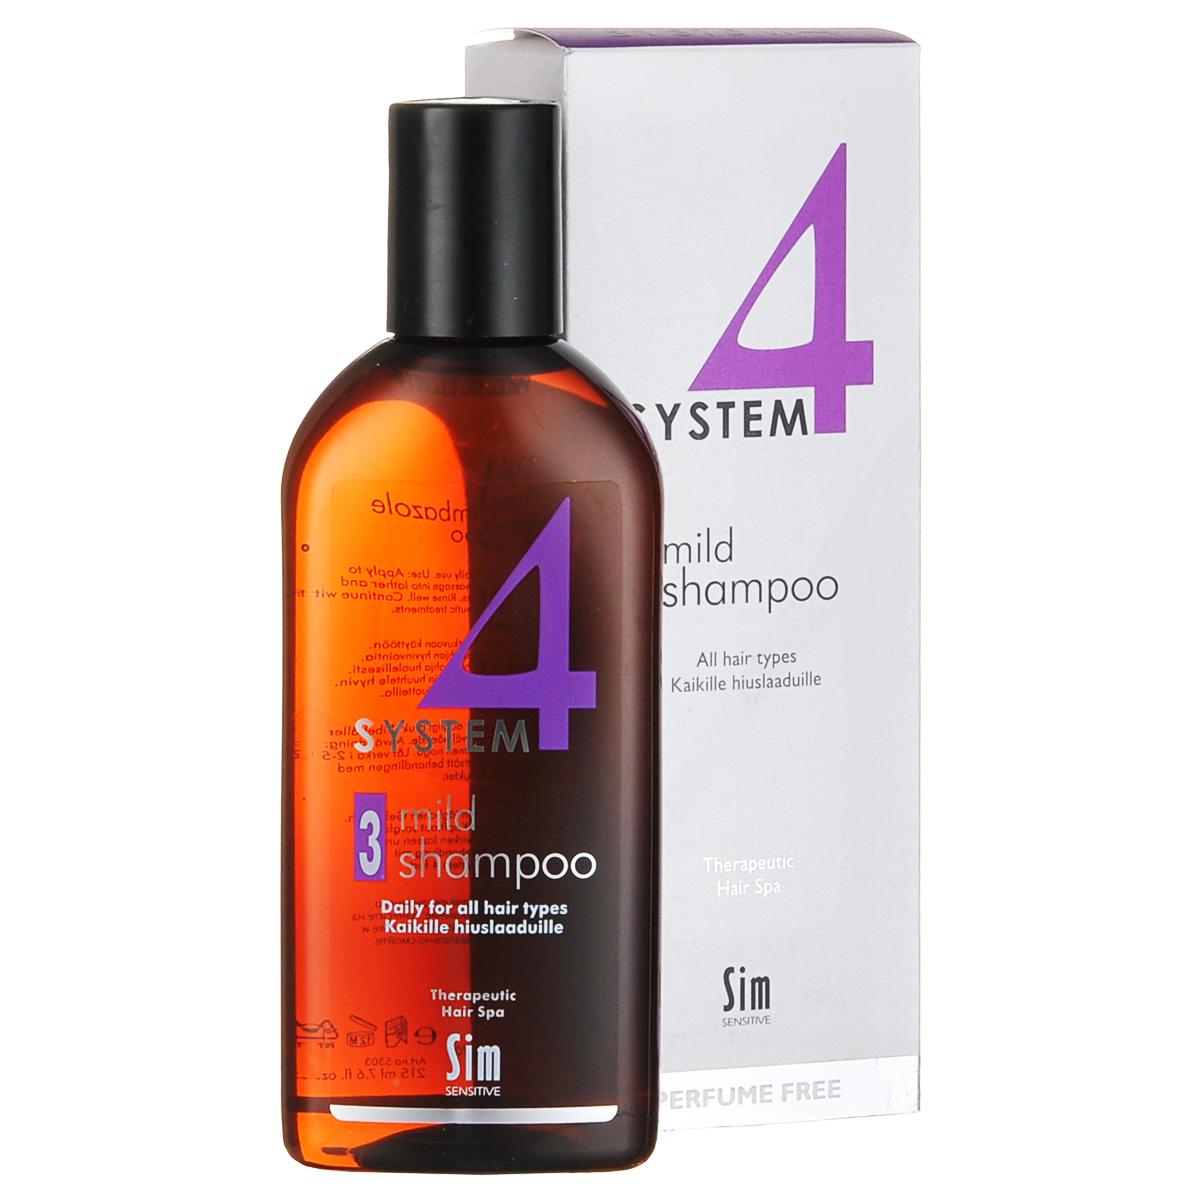 SIM SENSITIVE Терапевтический шампунь № 3 SYSTEM 4 Mild Climbazole Shampoo 3 , 215 мл (Sim Sensitive)